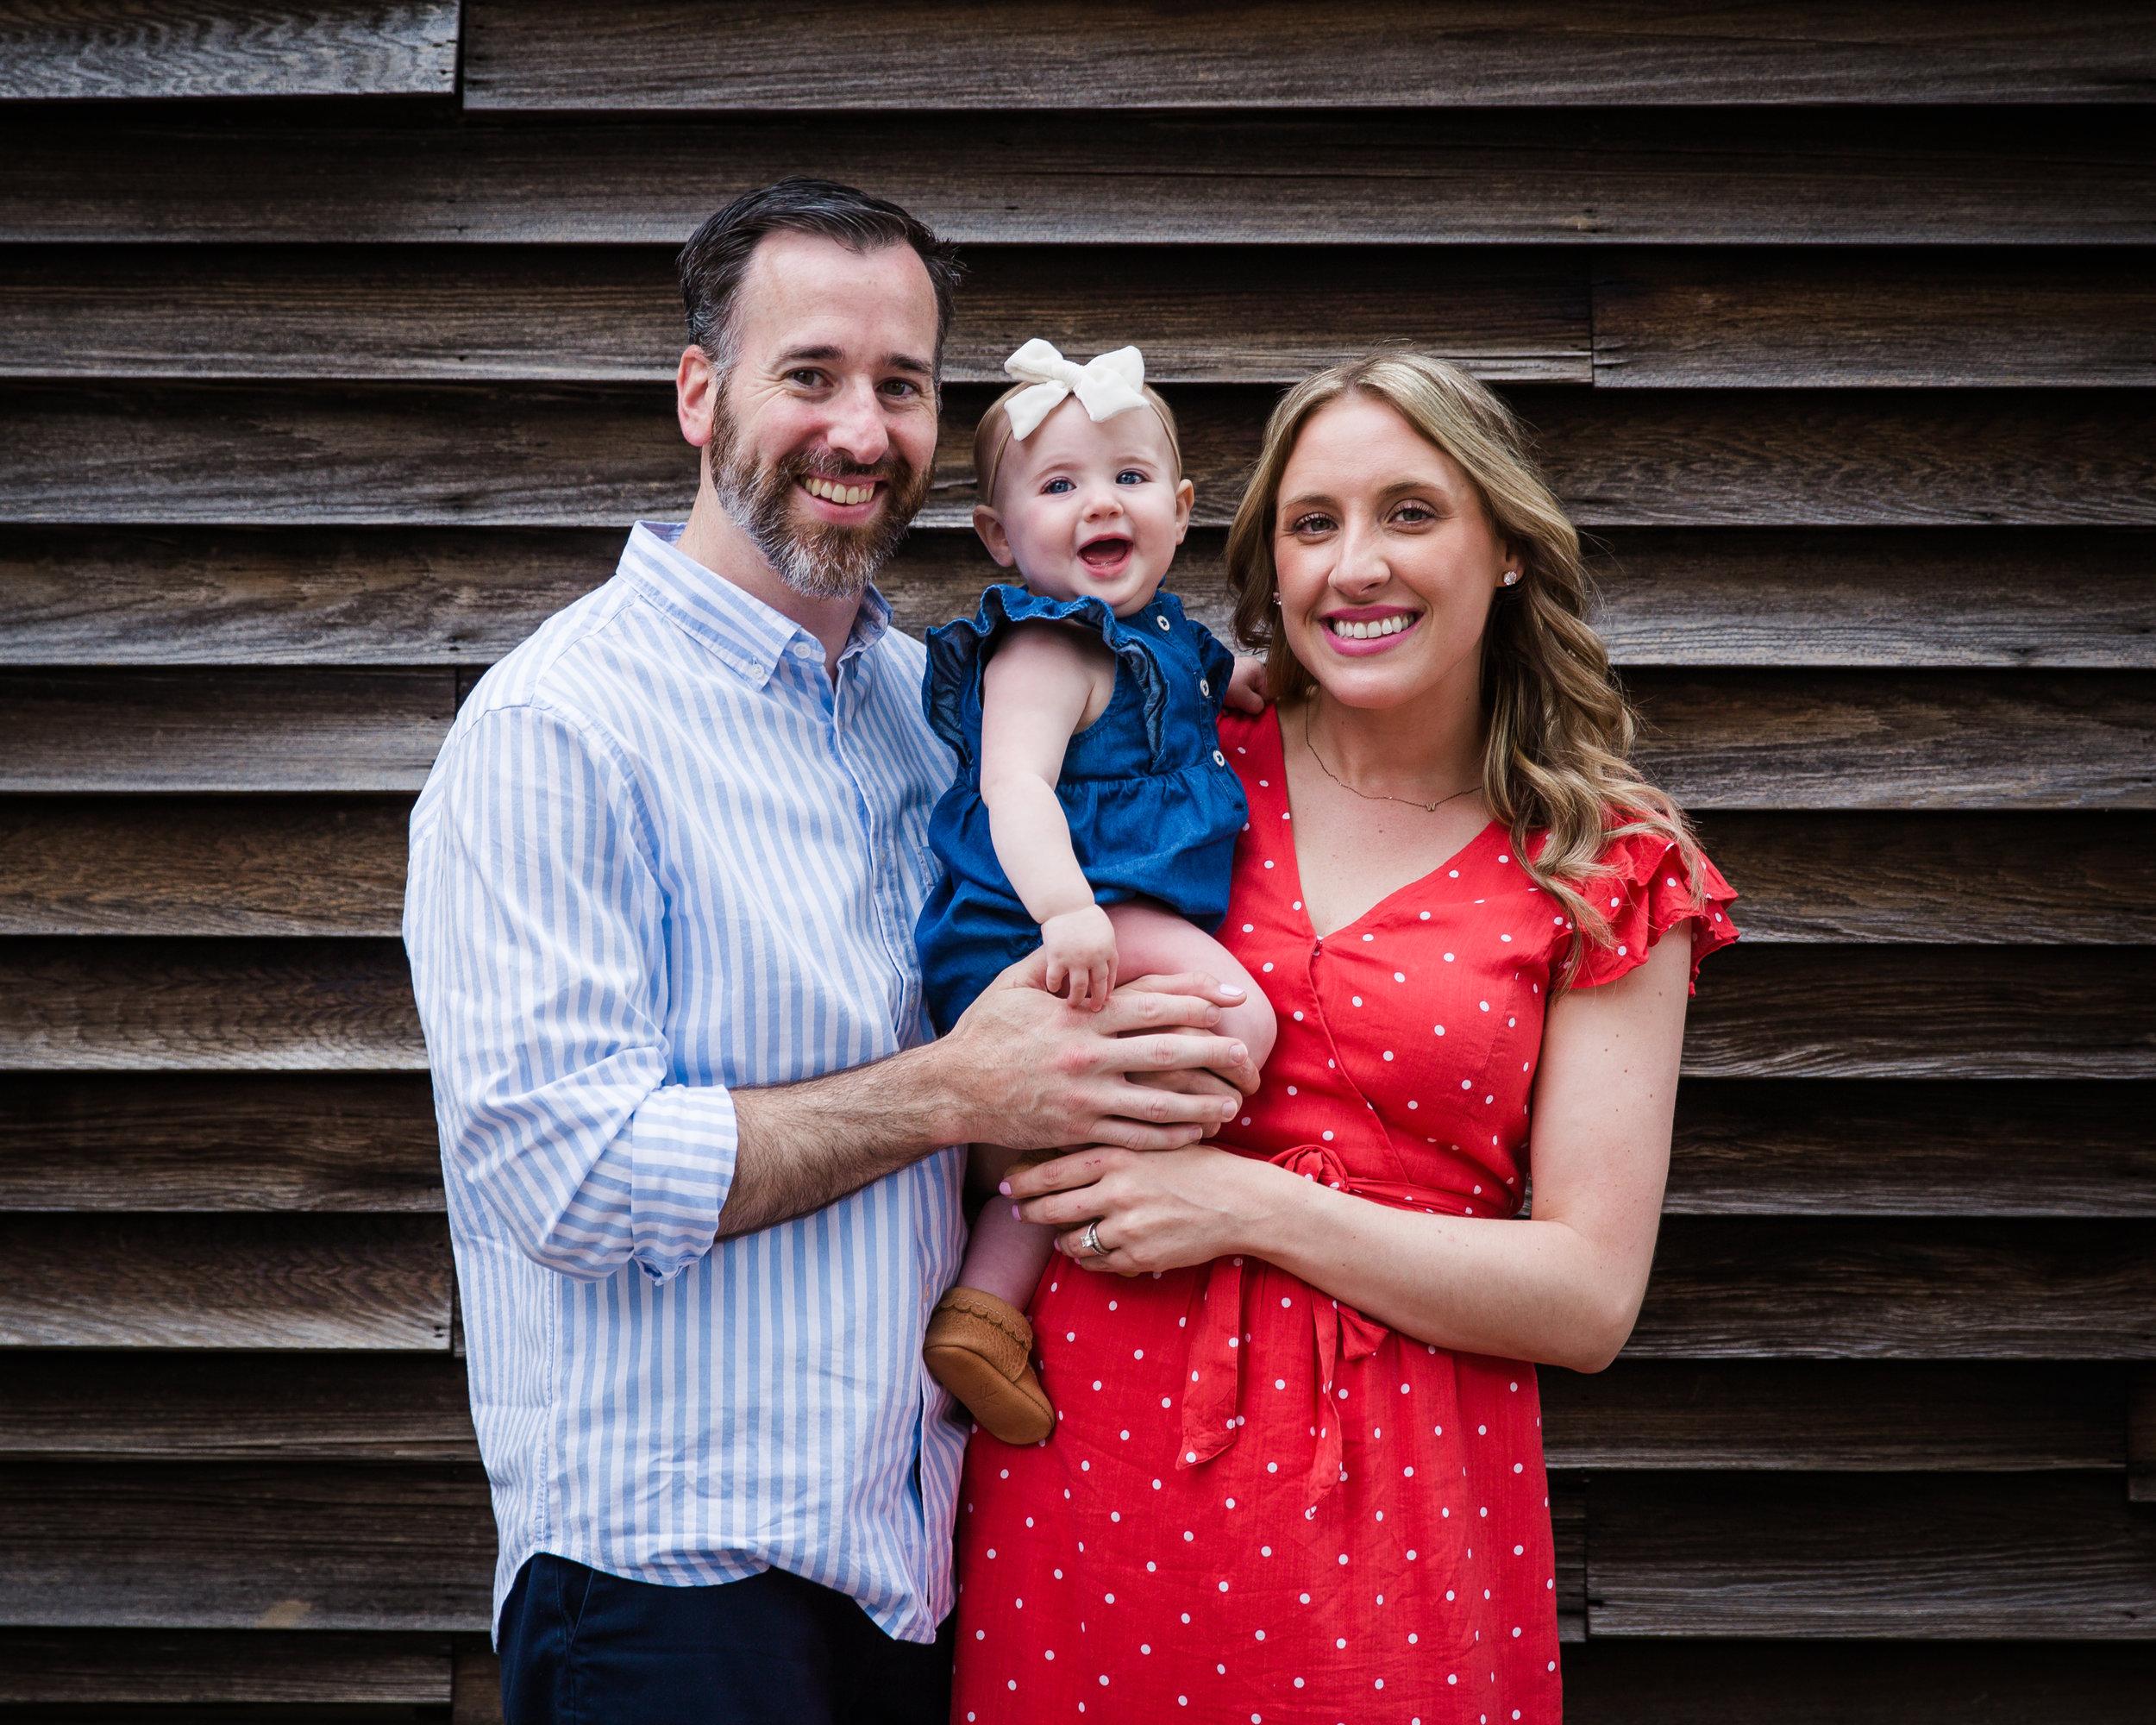 family-photo-first-birthday-celebration-photography-mommy-daddy